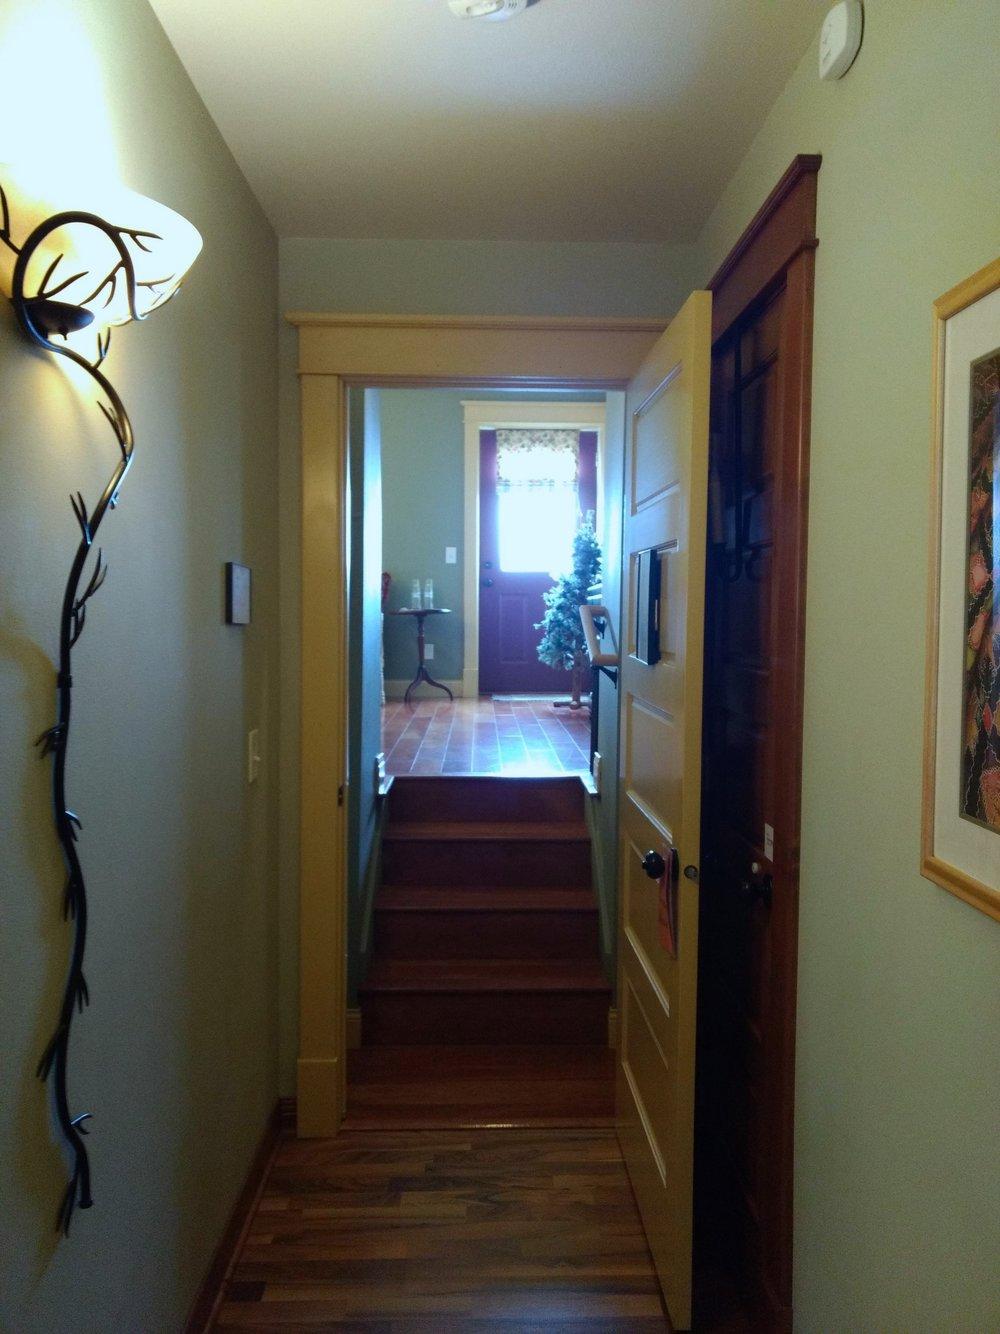 The Falls Room Entrance